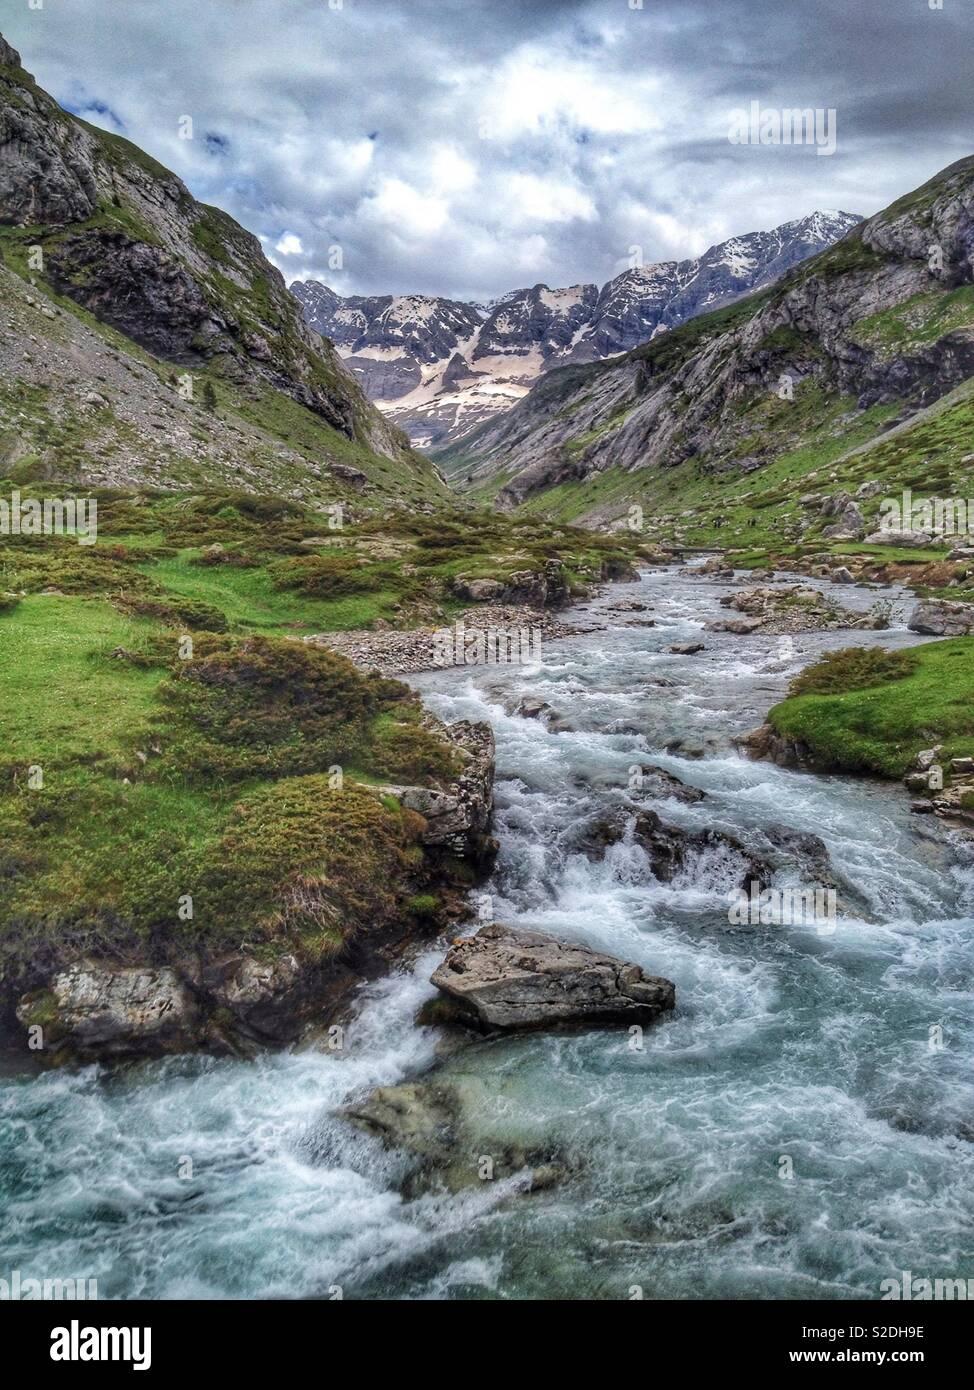 Il torrente ha dato de Marcadau a Pont d'Espagne, Hautes-Pyrenees, Cauterets, Occitanie Francia Immagini Stock